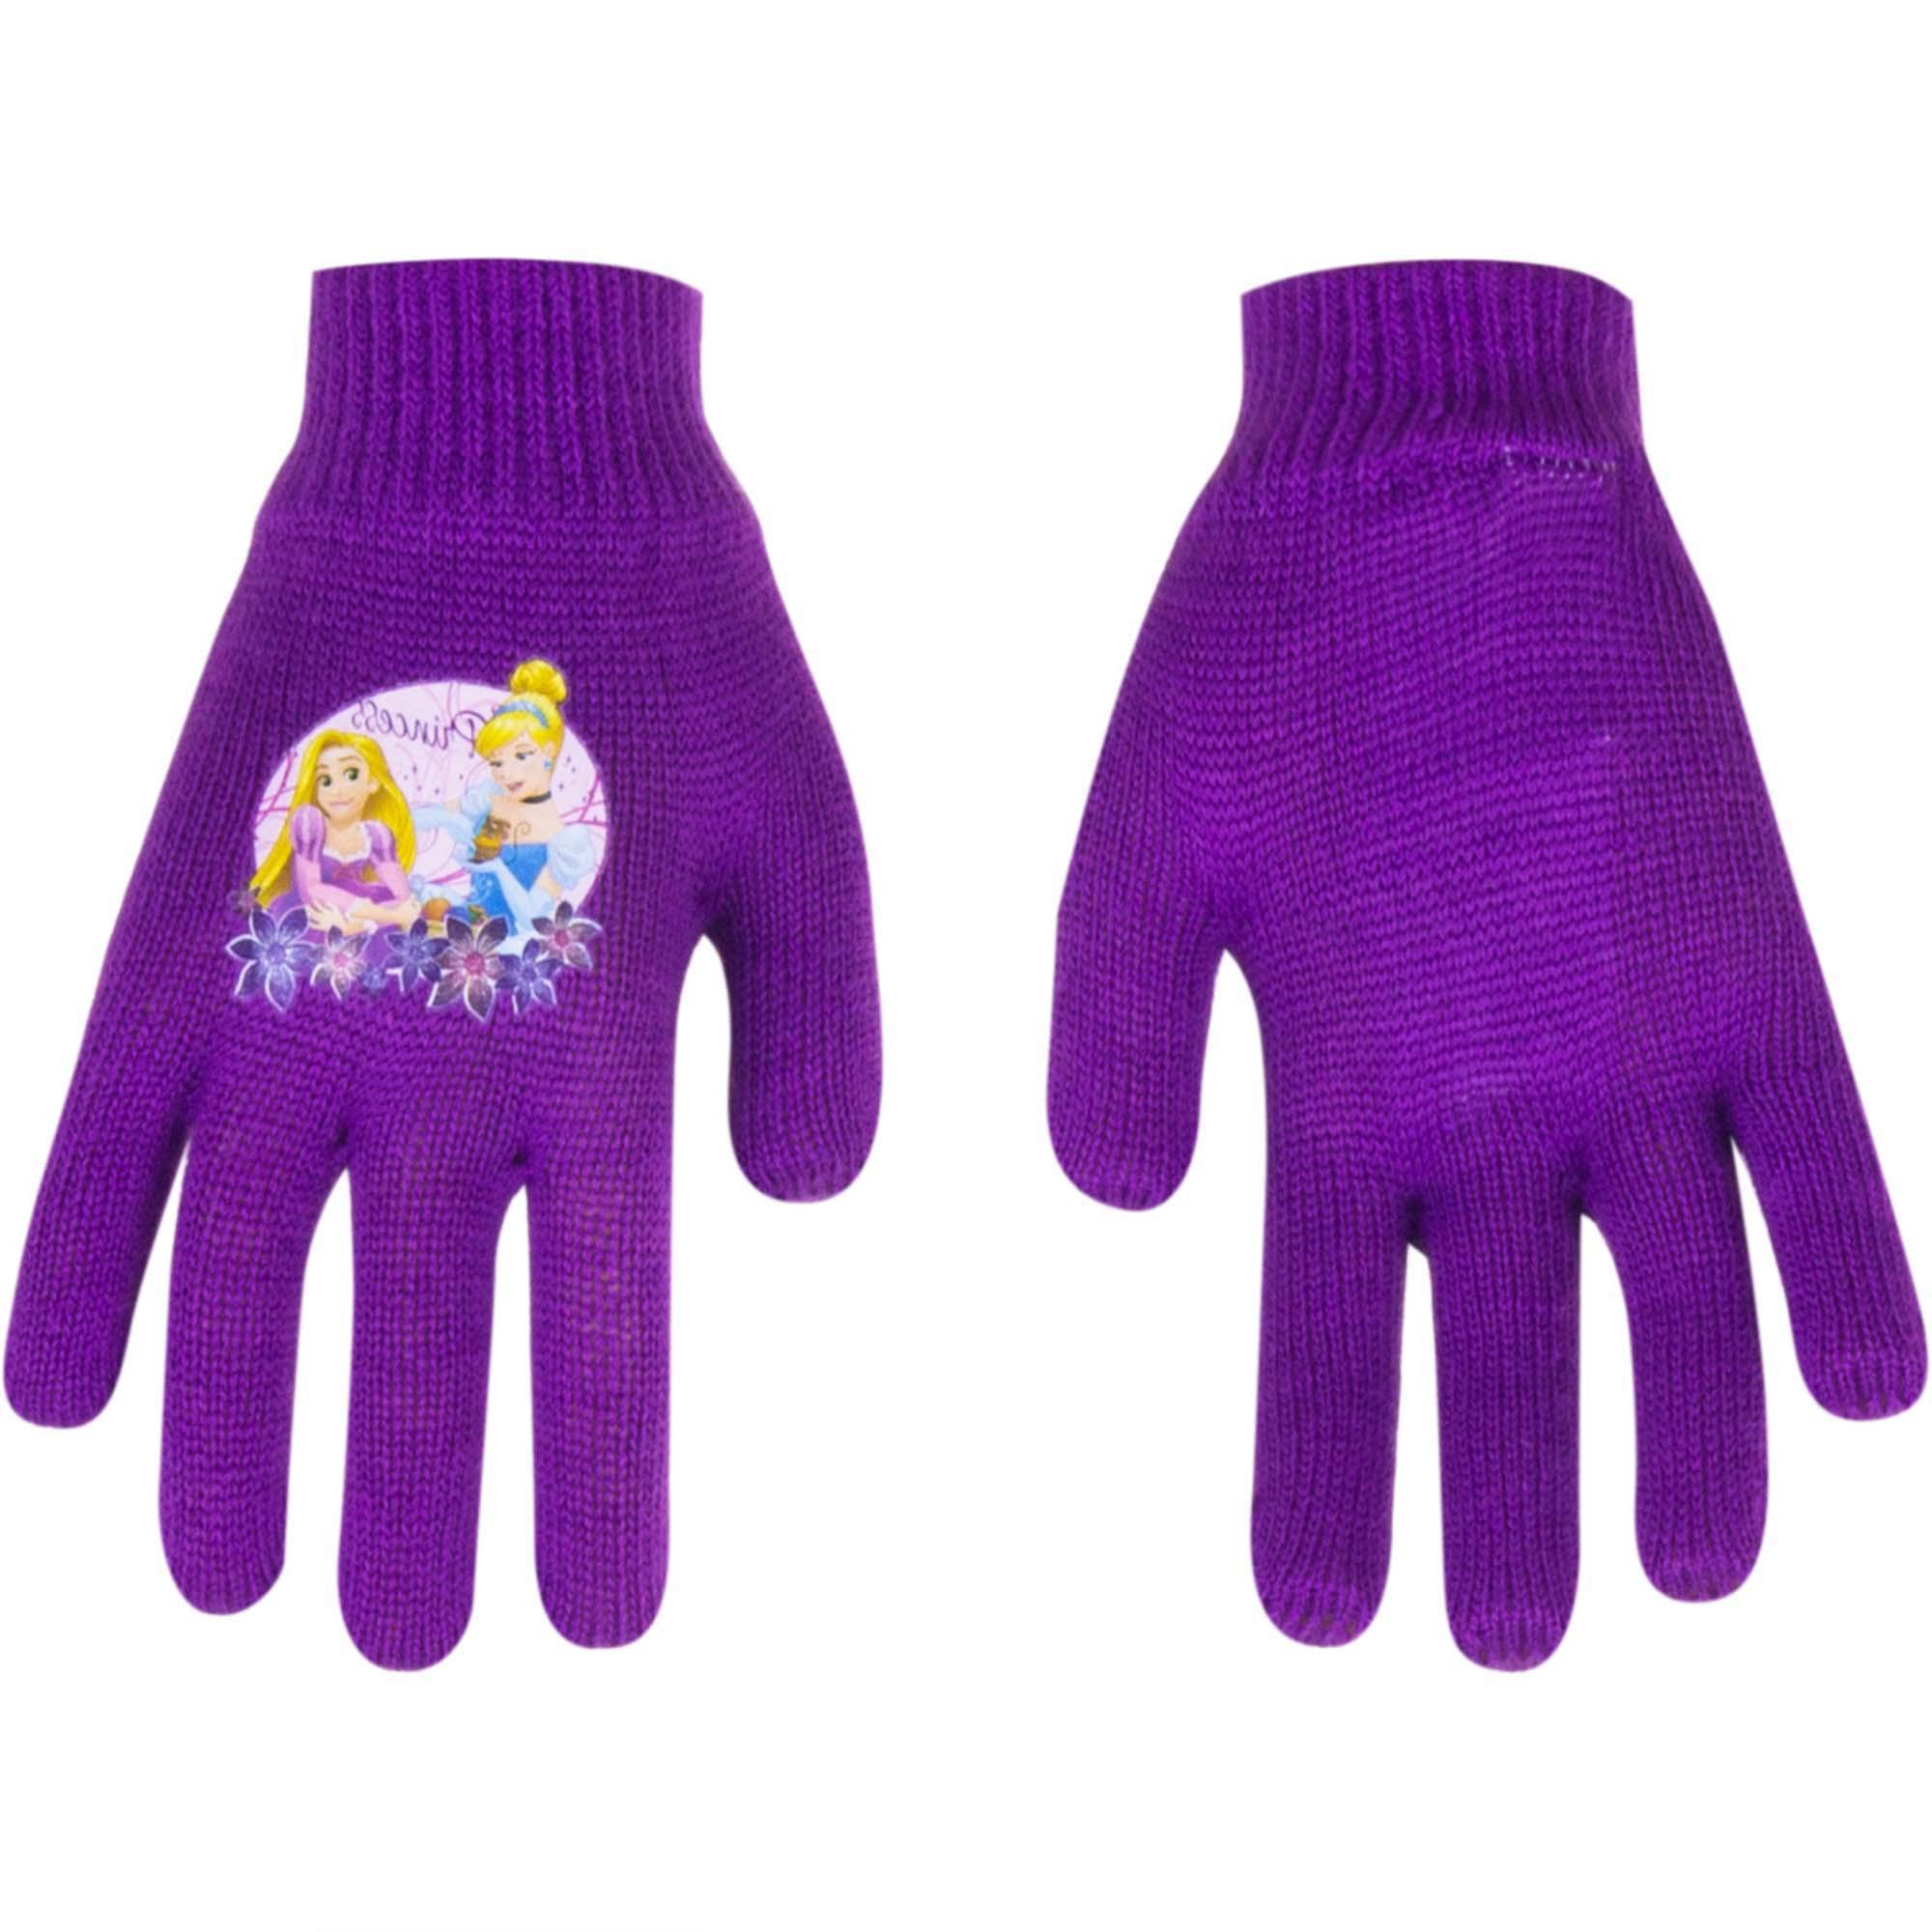 Princess gloves Magic_Purle (Ηλικία: 2-5 ετών)